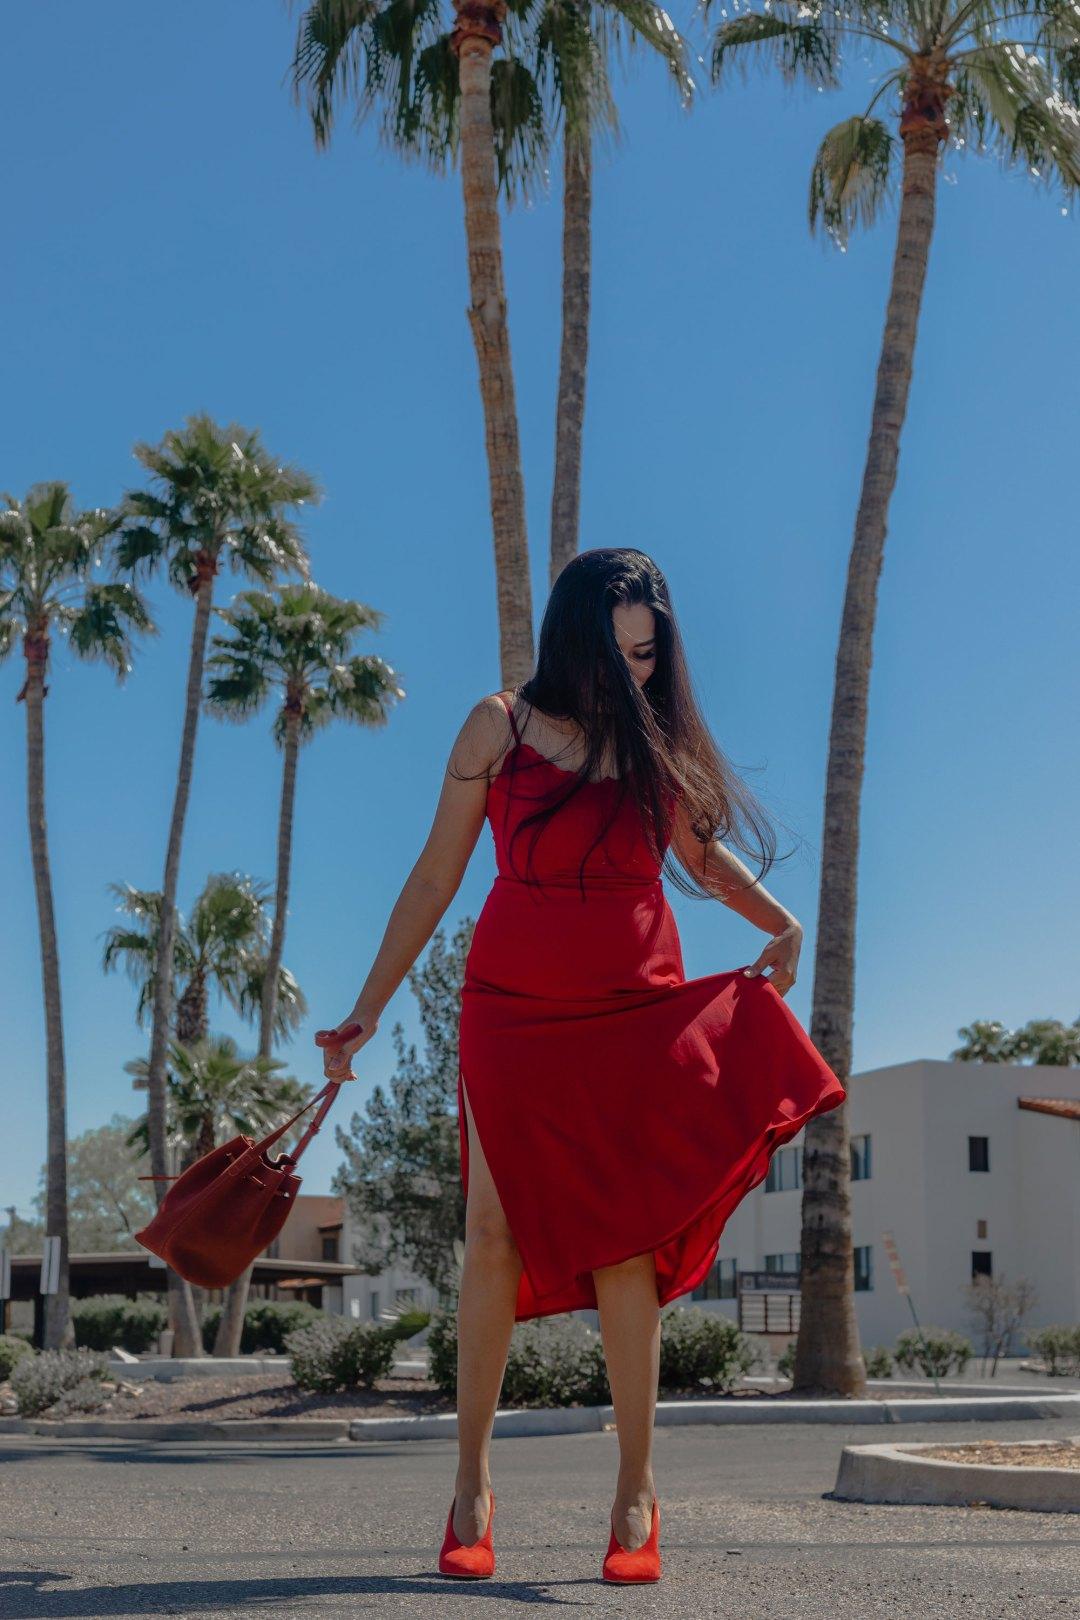 Spring-Dresses-_-Facing-Your-Fear_allaboutgoodvibes.com-Molly-Larsen-Style-blogger-Tucson-Arizona-Thai